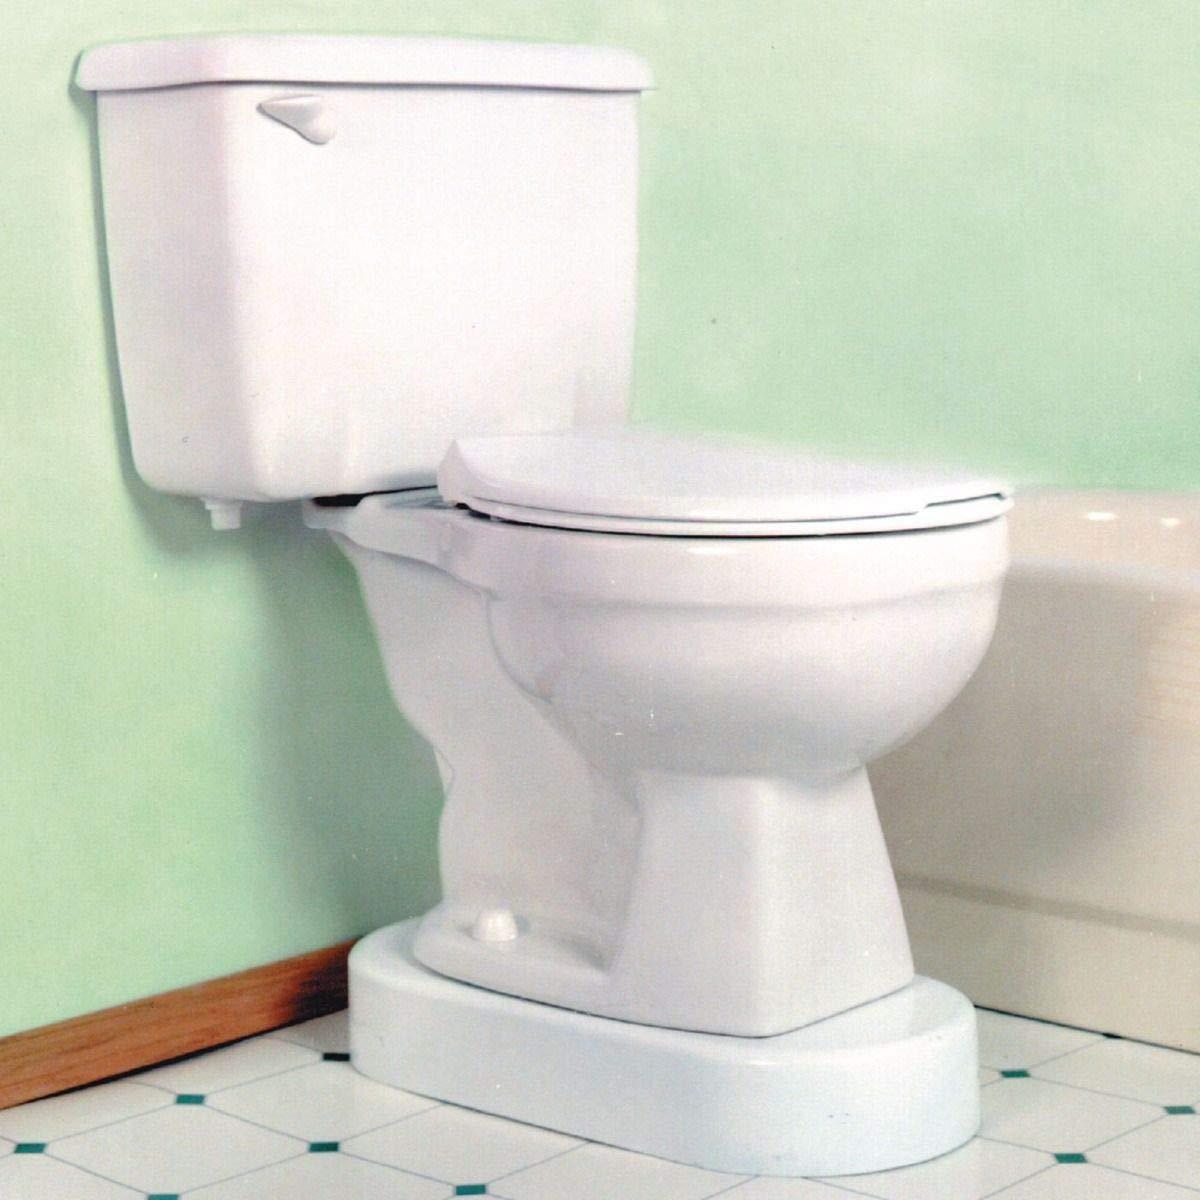 Toilevator Toilet Riser, 11-1/2''W x 23''L x 3-1/2''H, 500-lb Capacity by Toilevator¨